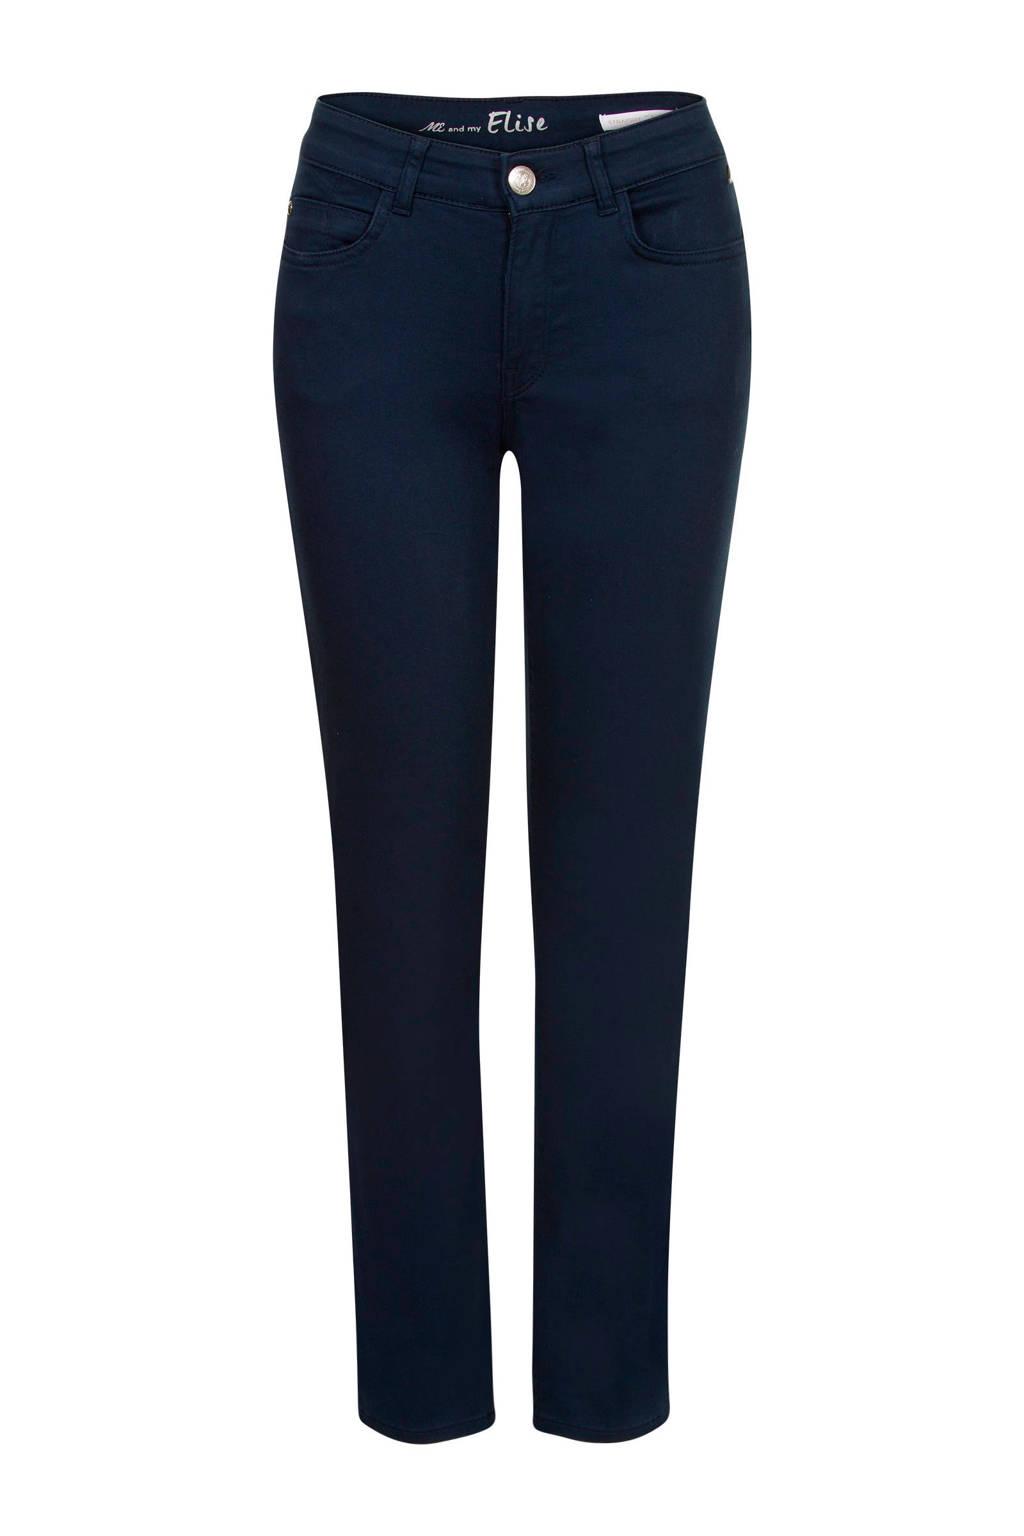 Miss Etam Regulier slim fit jeans Elise 28 inch donkerblauw, Donkerblauw